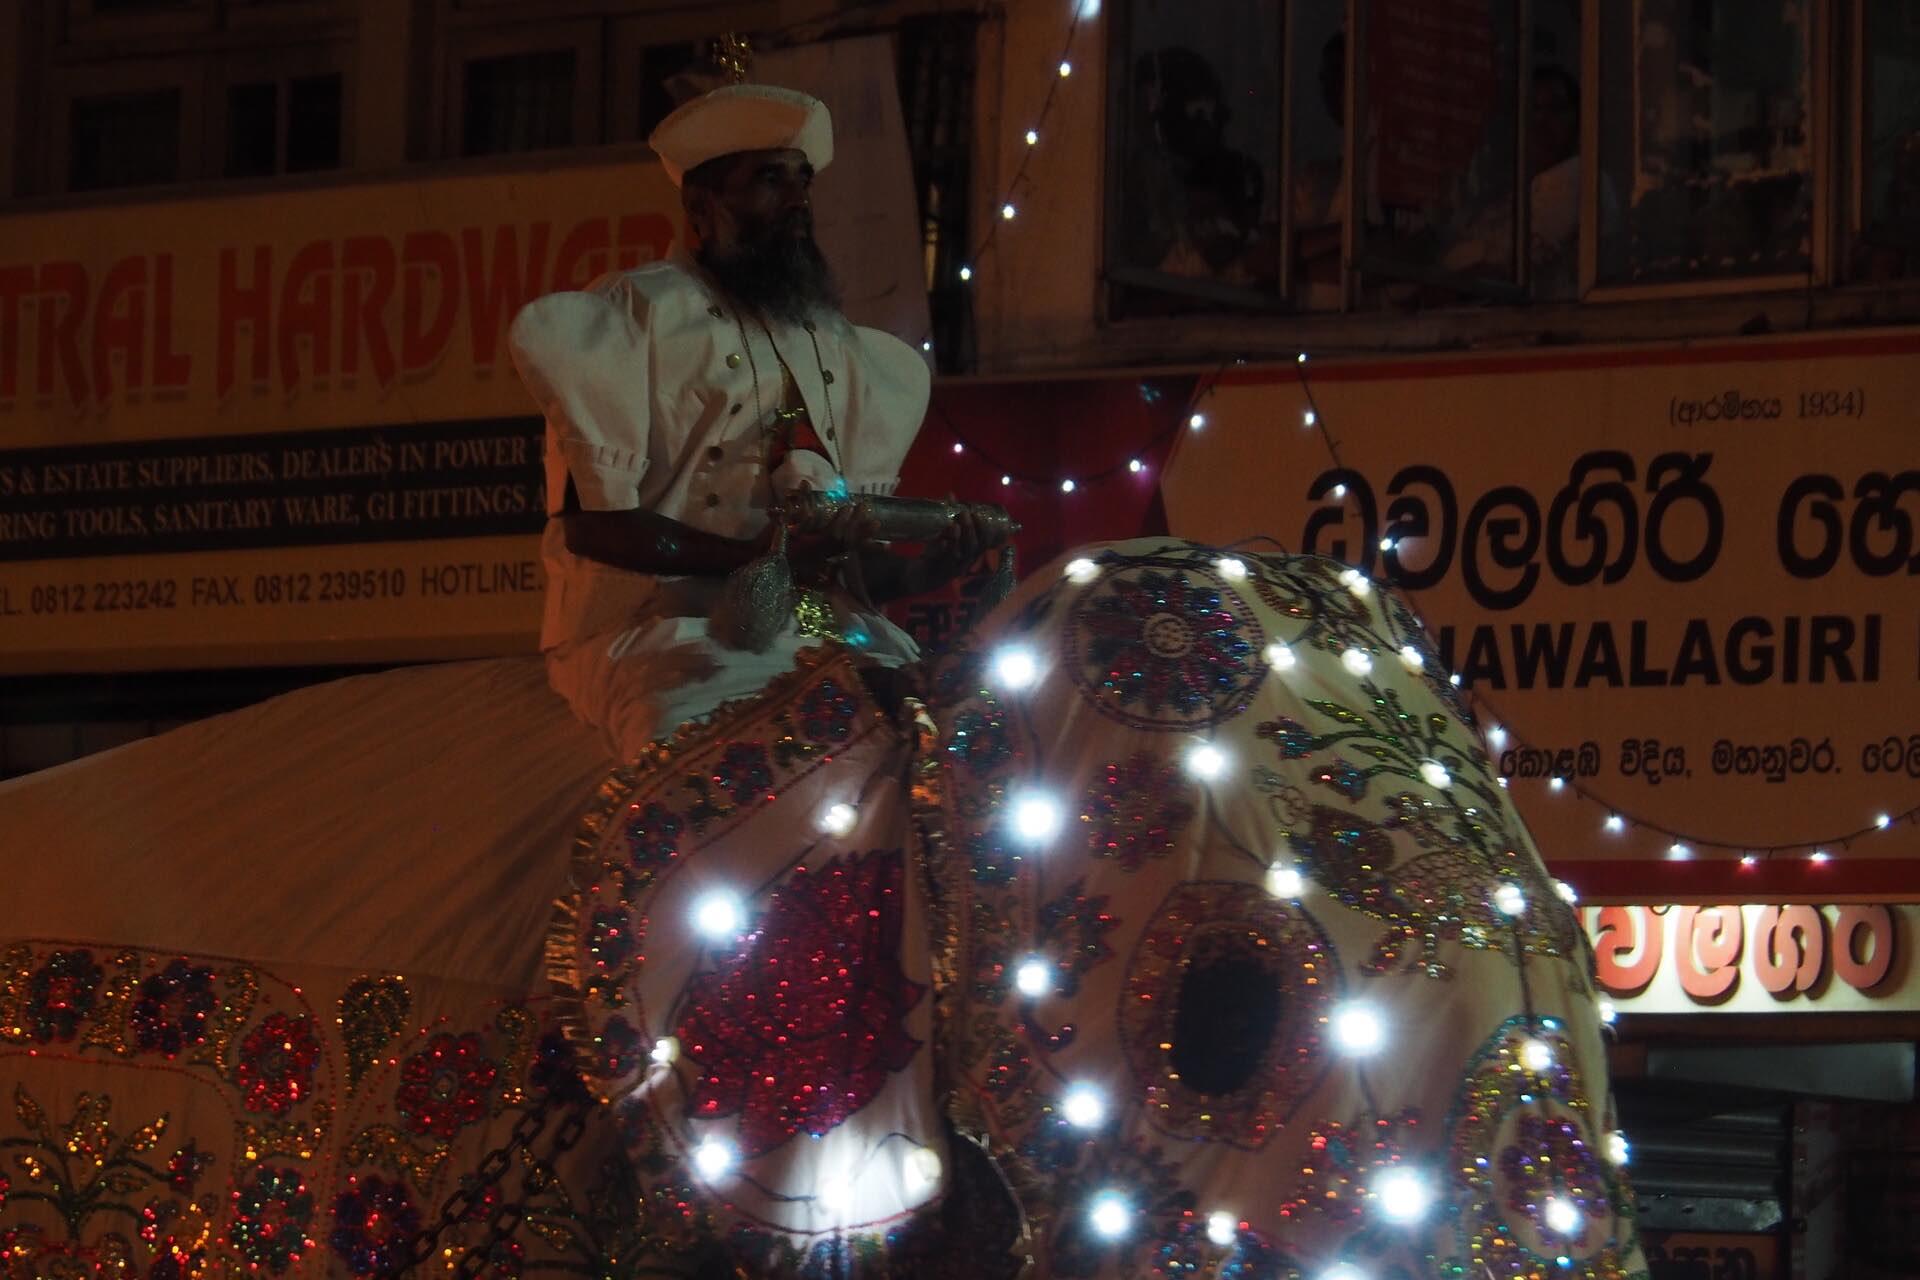 sri-lanka-kandy-perahera-elephants-holiday-review-feedback-invite-to-paradise-quentin-kate-hulm.jpg